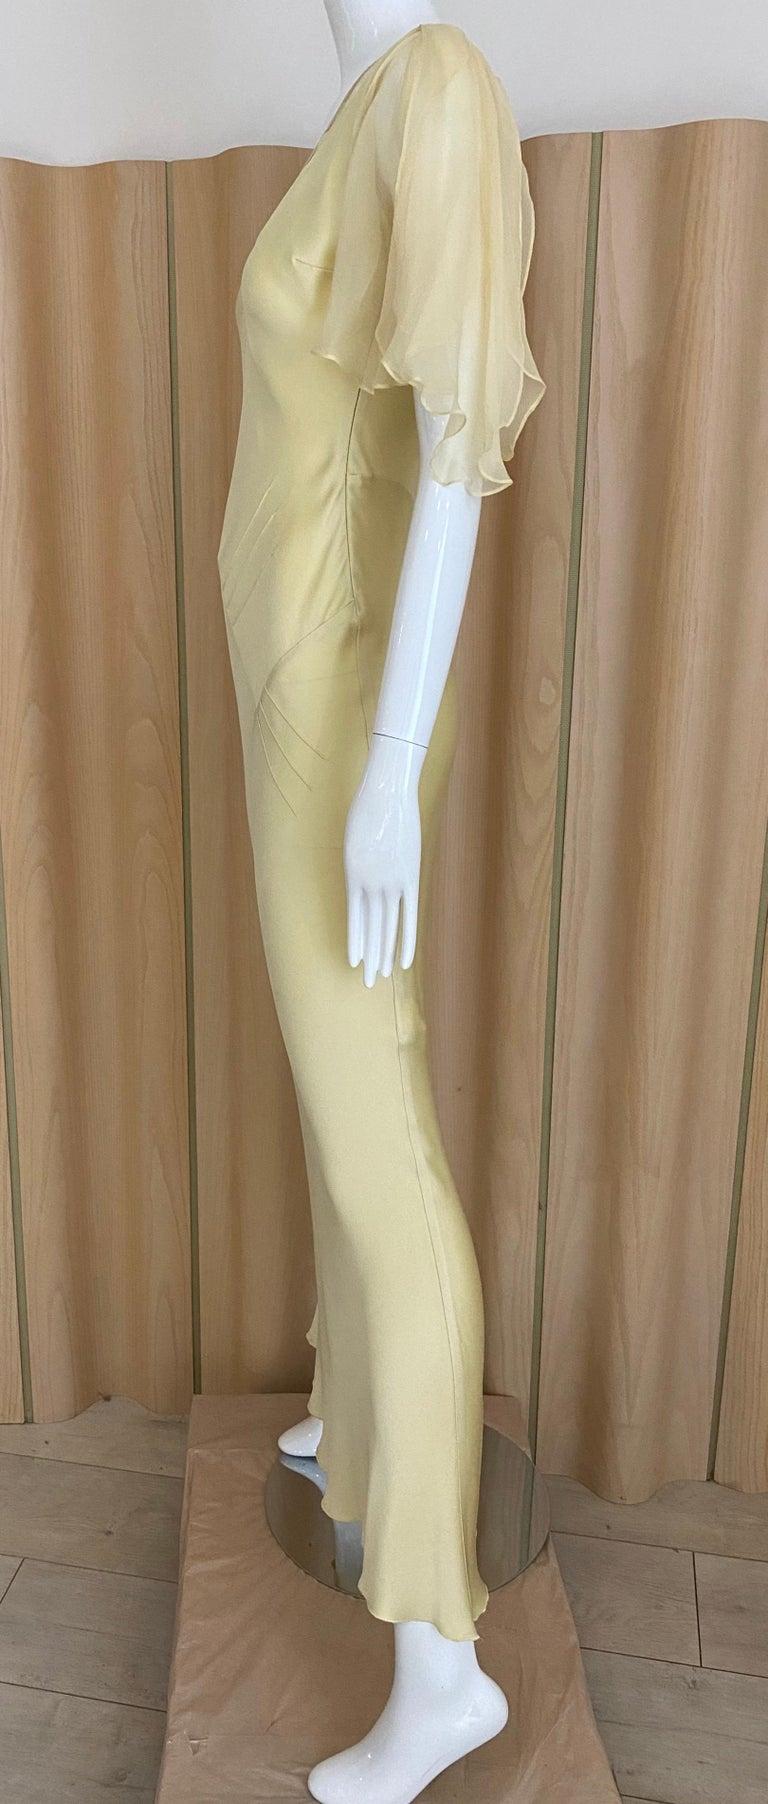 1990s John Galliano Cream Silk Charmeuse Bias Cut Dress For Sale 3